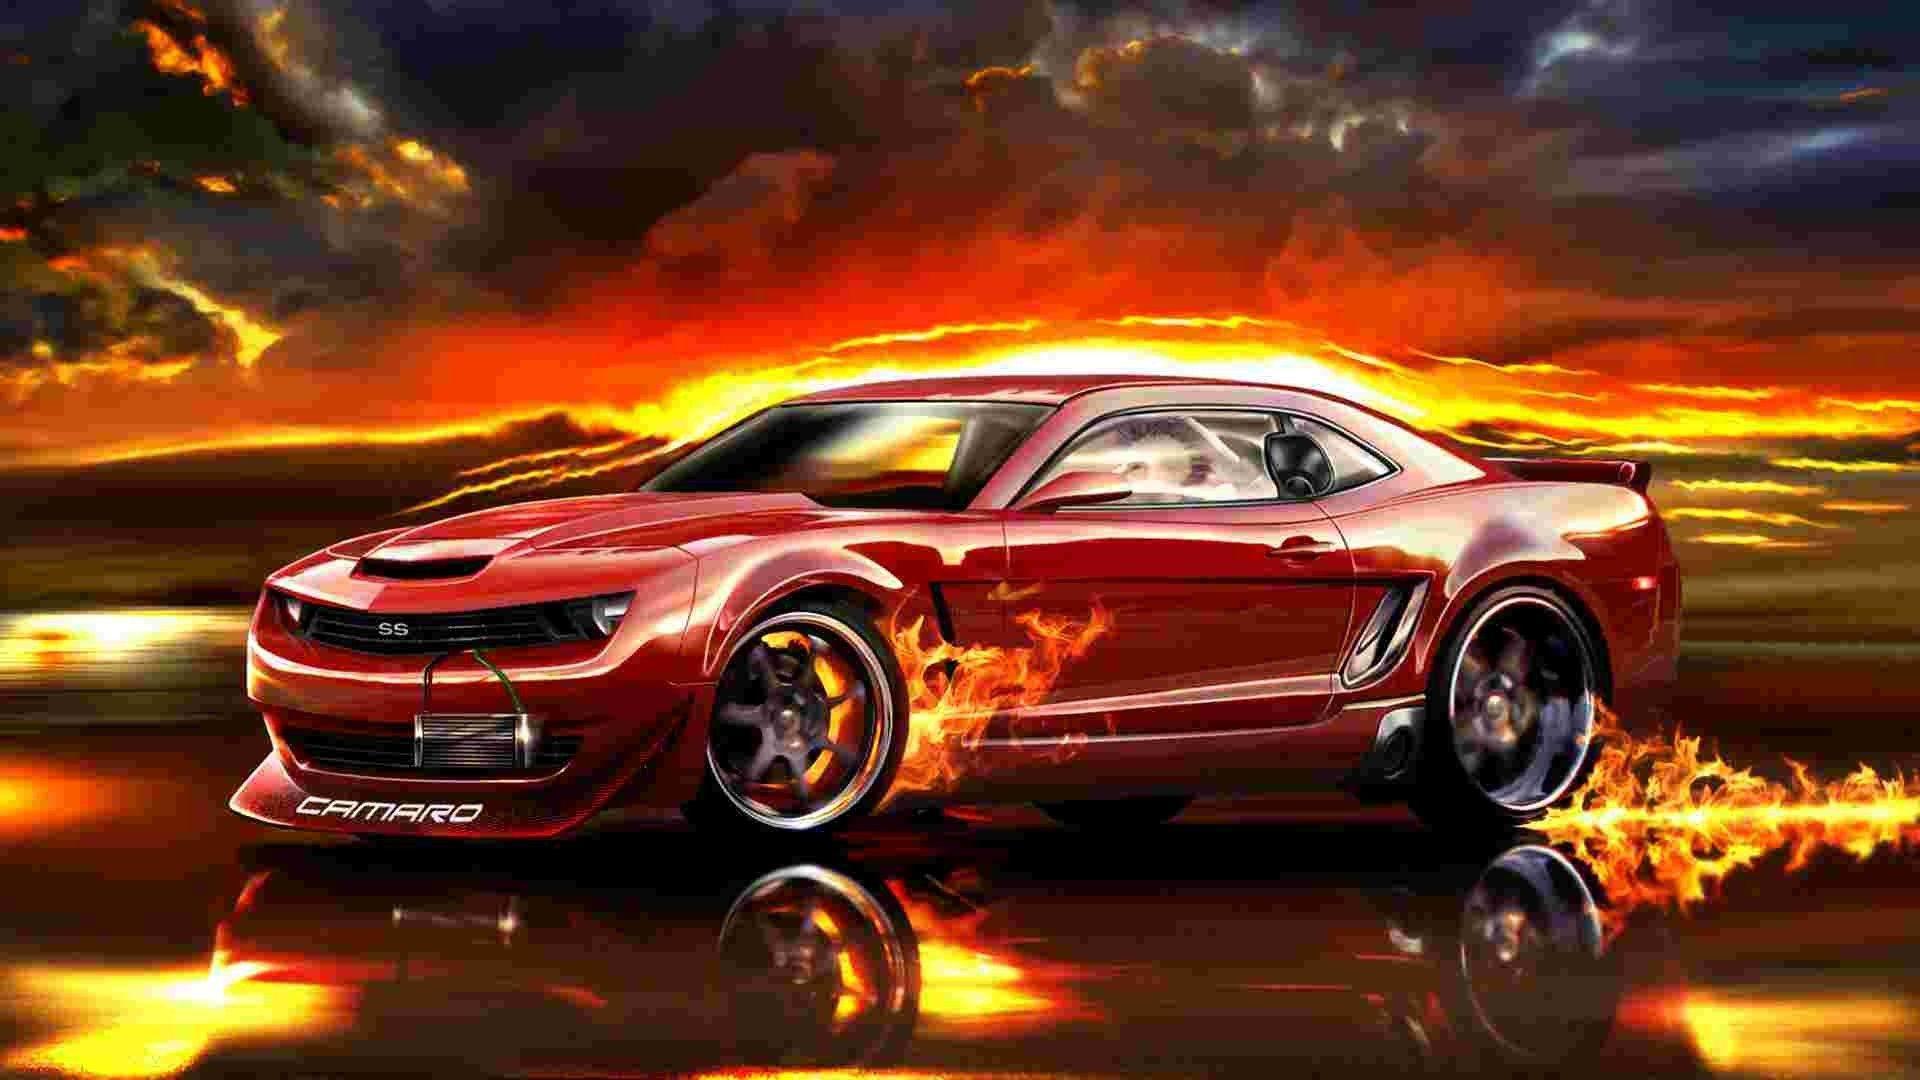 58 Best Free Cool Camaro Wallpapers Wallpaperaccess